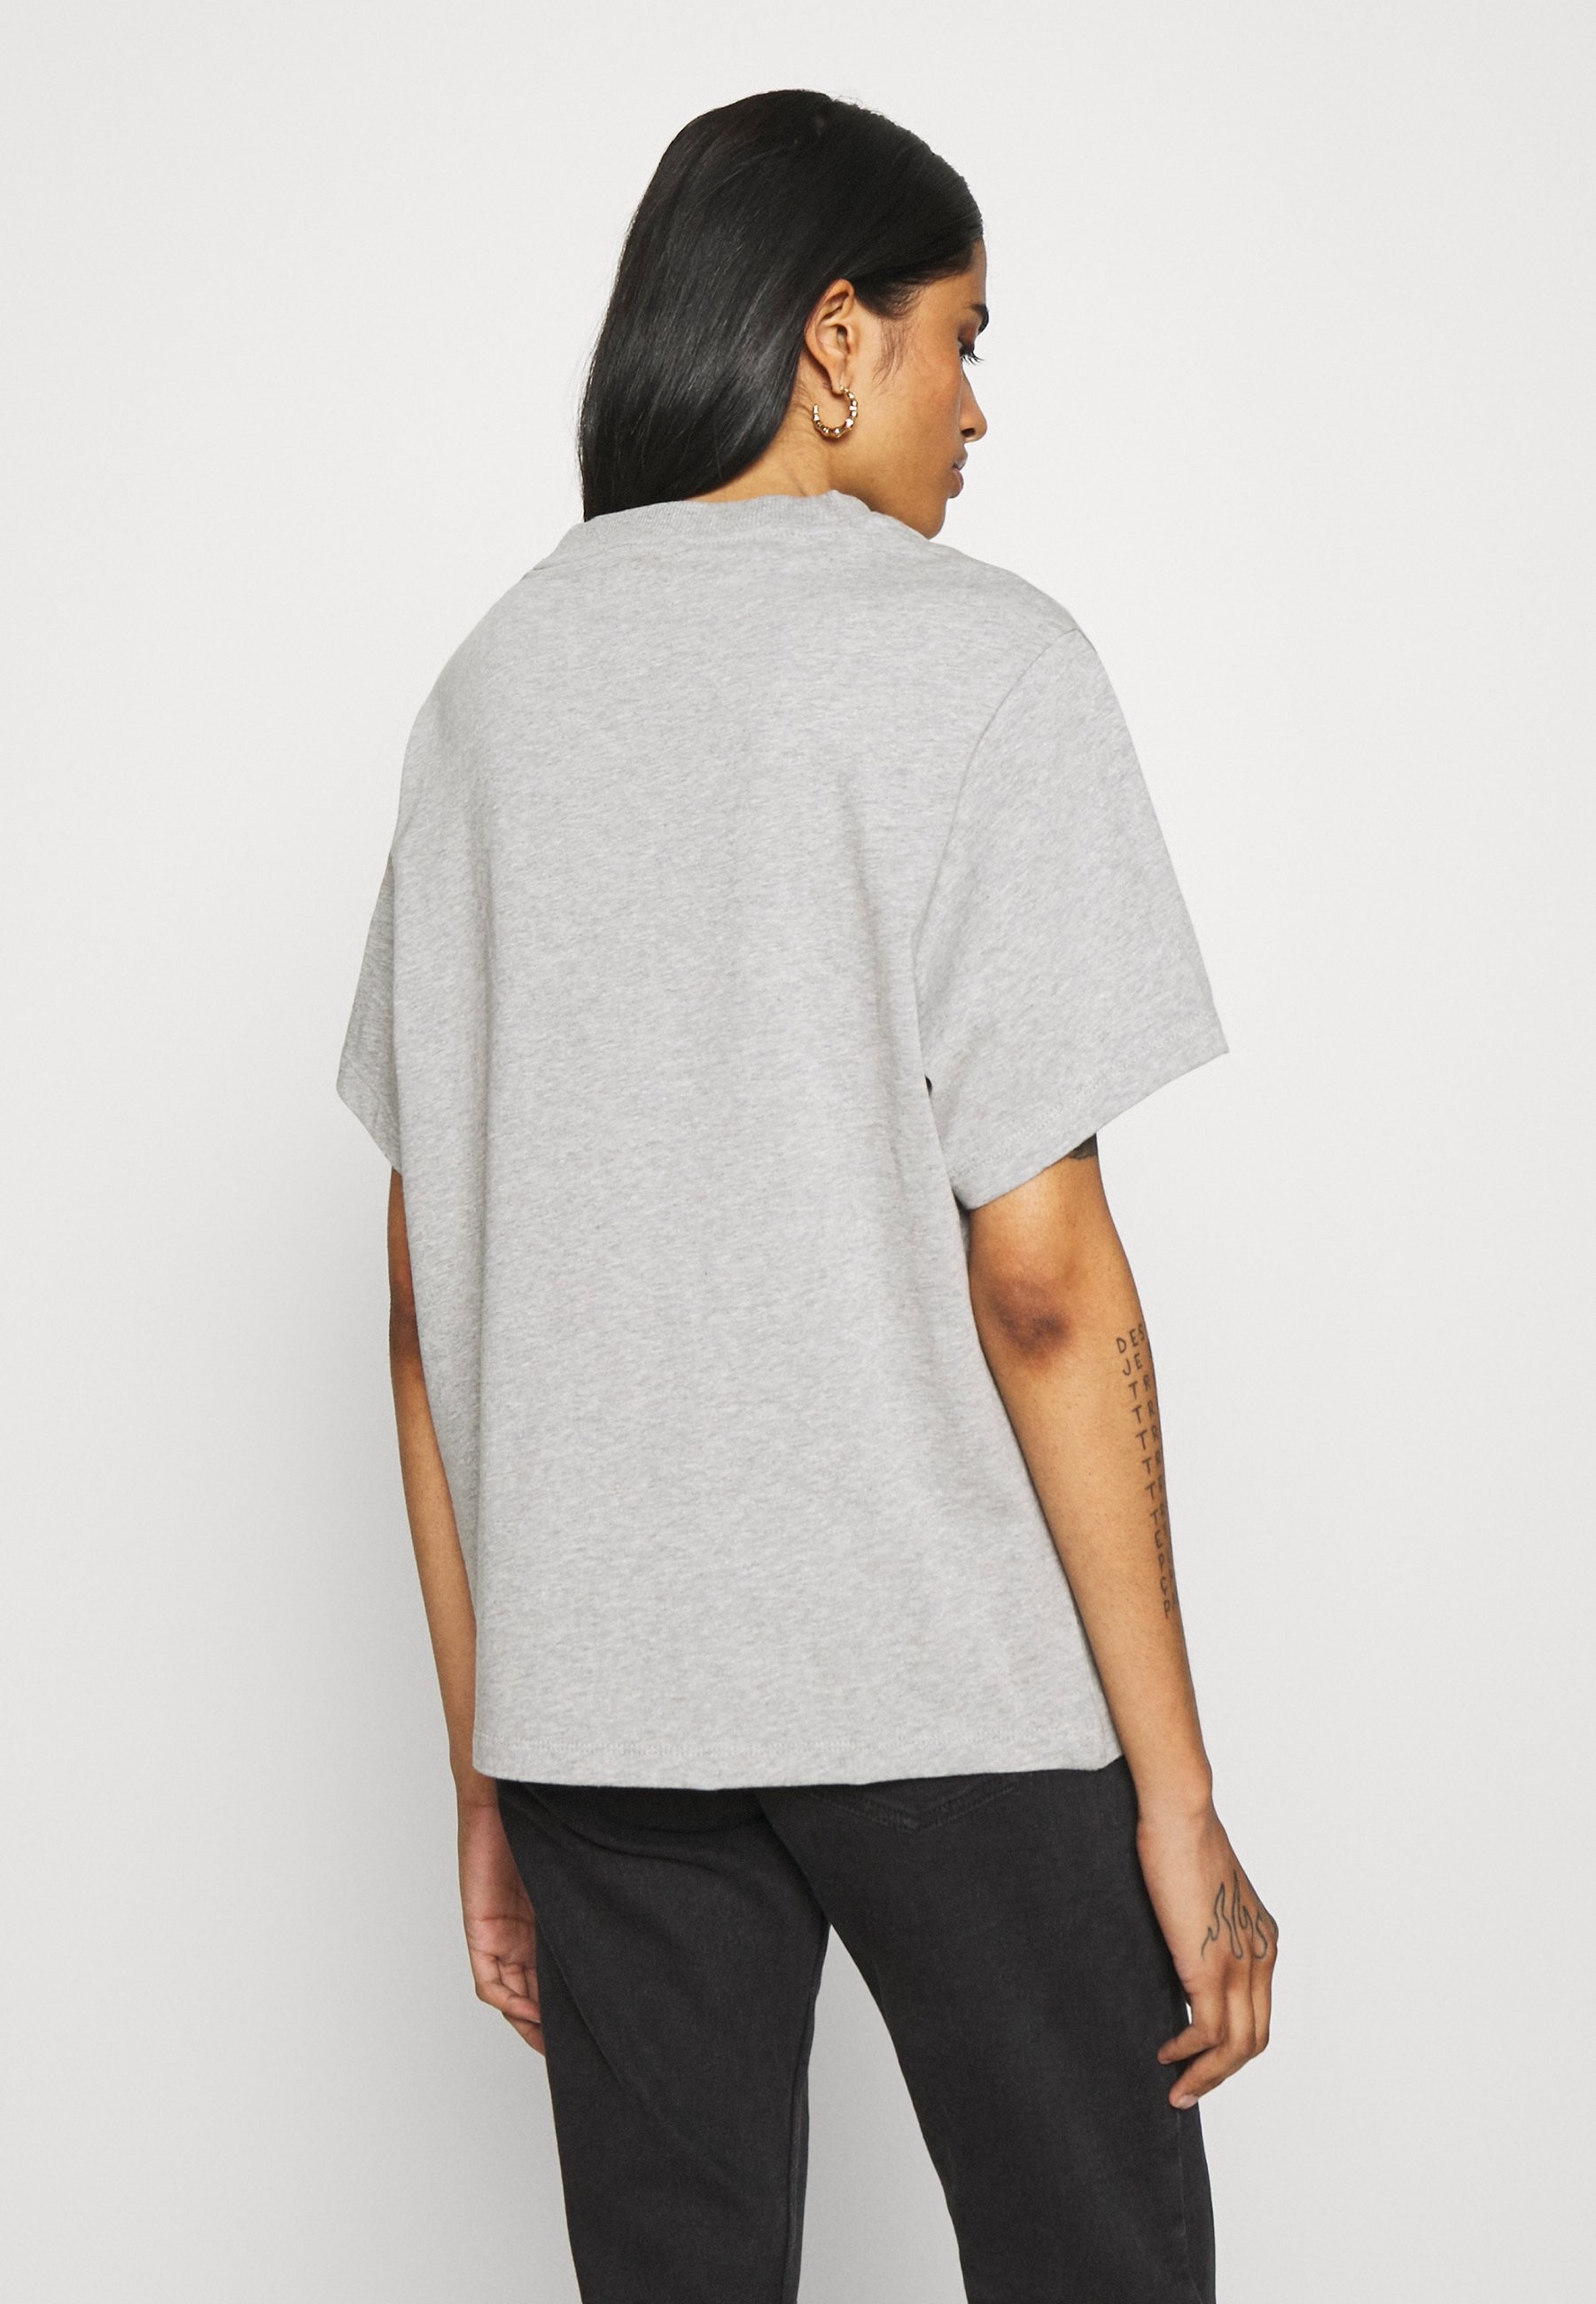 Adidas Originals T-shirt - T-shirts Med Print Medium Grey Heather/grå-melert